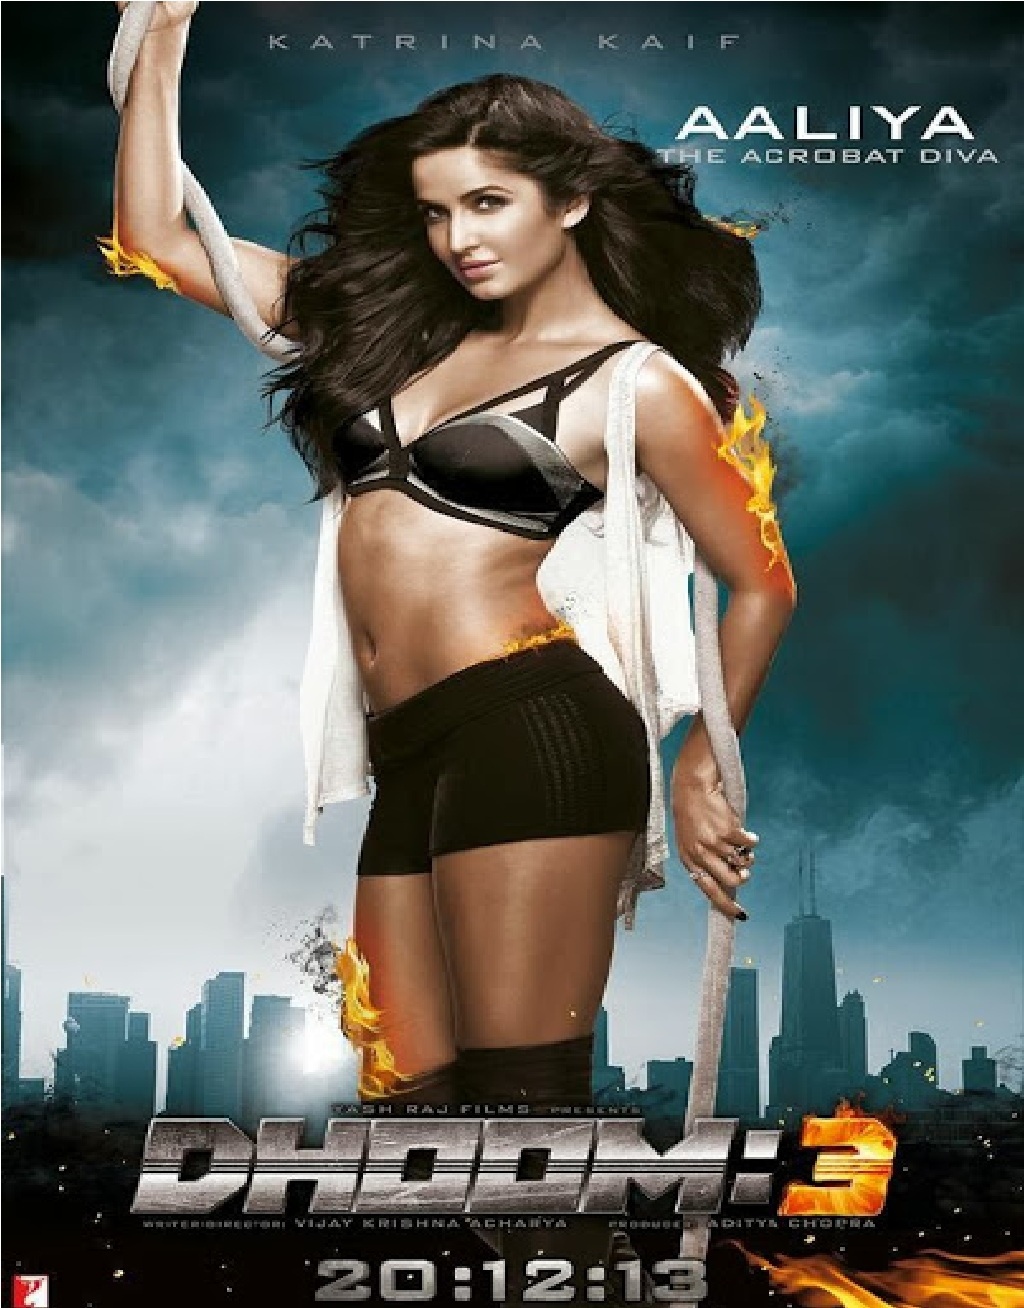 Katrina Kaif in dhoom 3 phoster